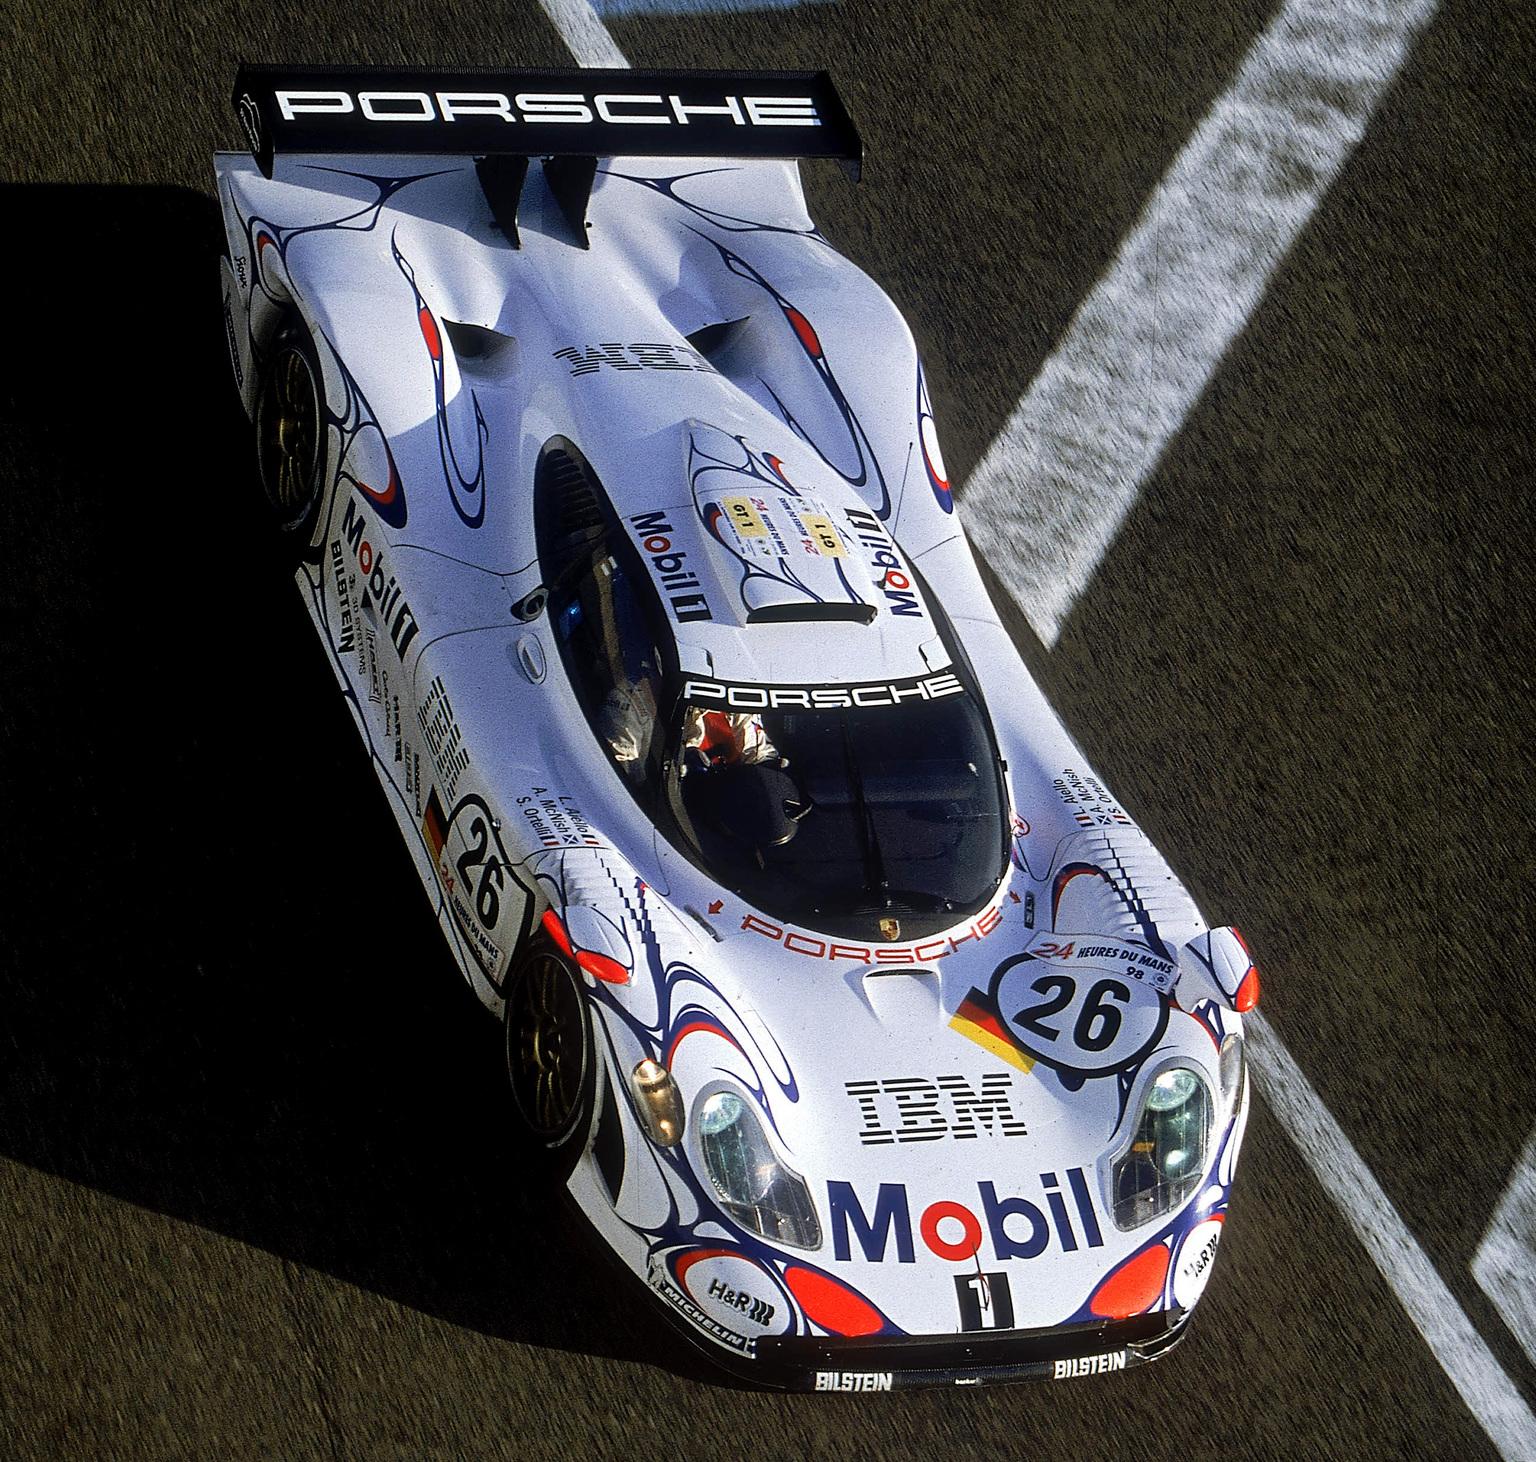 1998_Porsche_911GT198-4-1536 Remarkable Porsche 911 Gt1 (996) Road Car Cars Trend